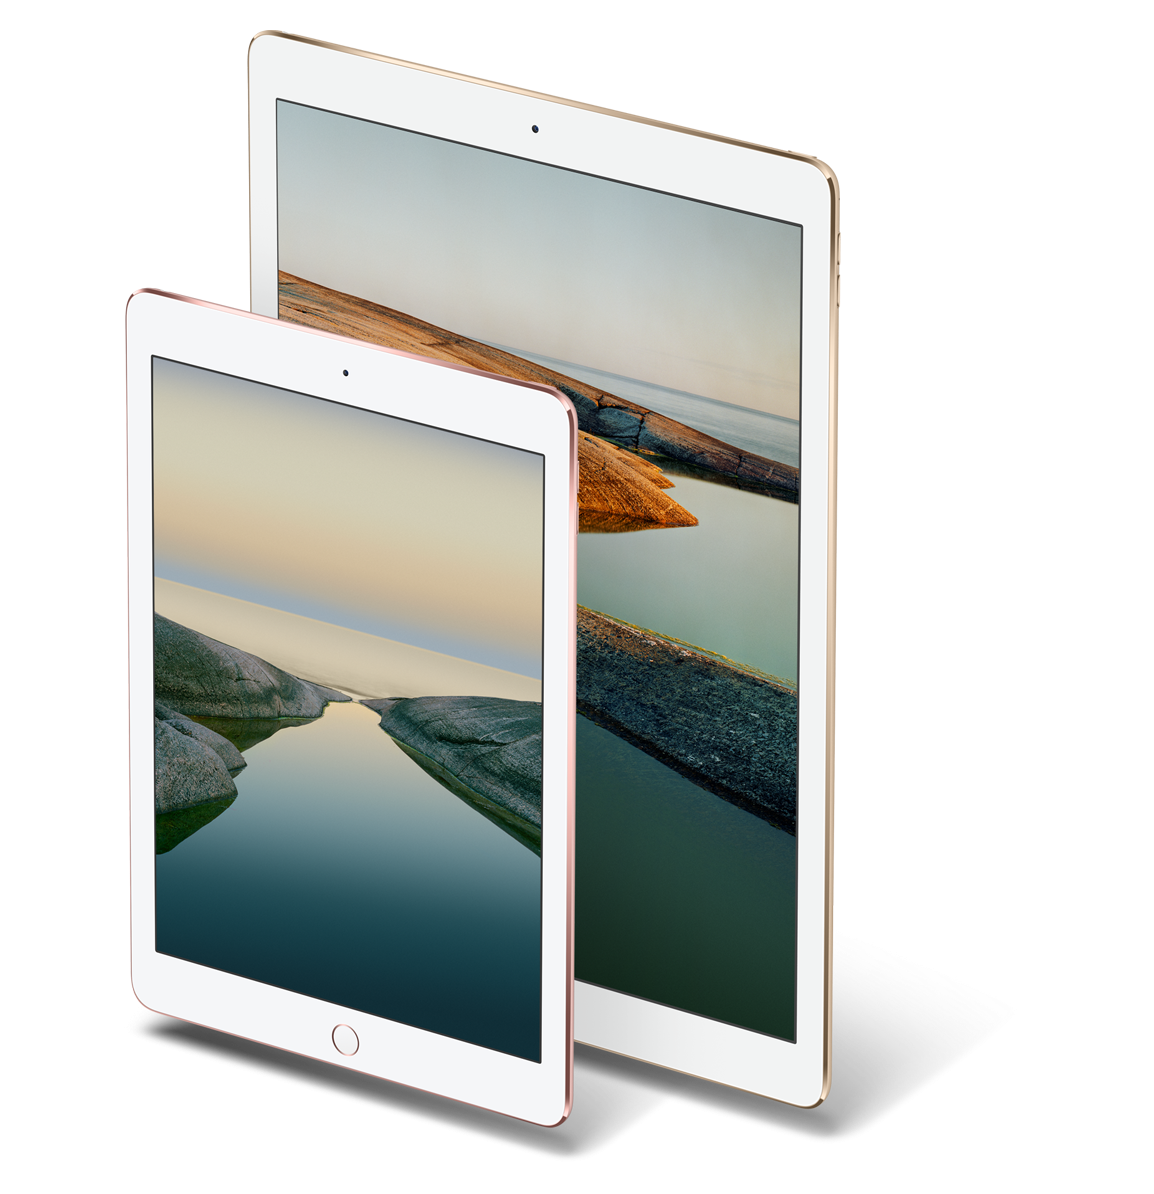 12 9 Inch Ipad Pro Ipad Pro Ipad New Ipad Pro